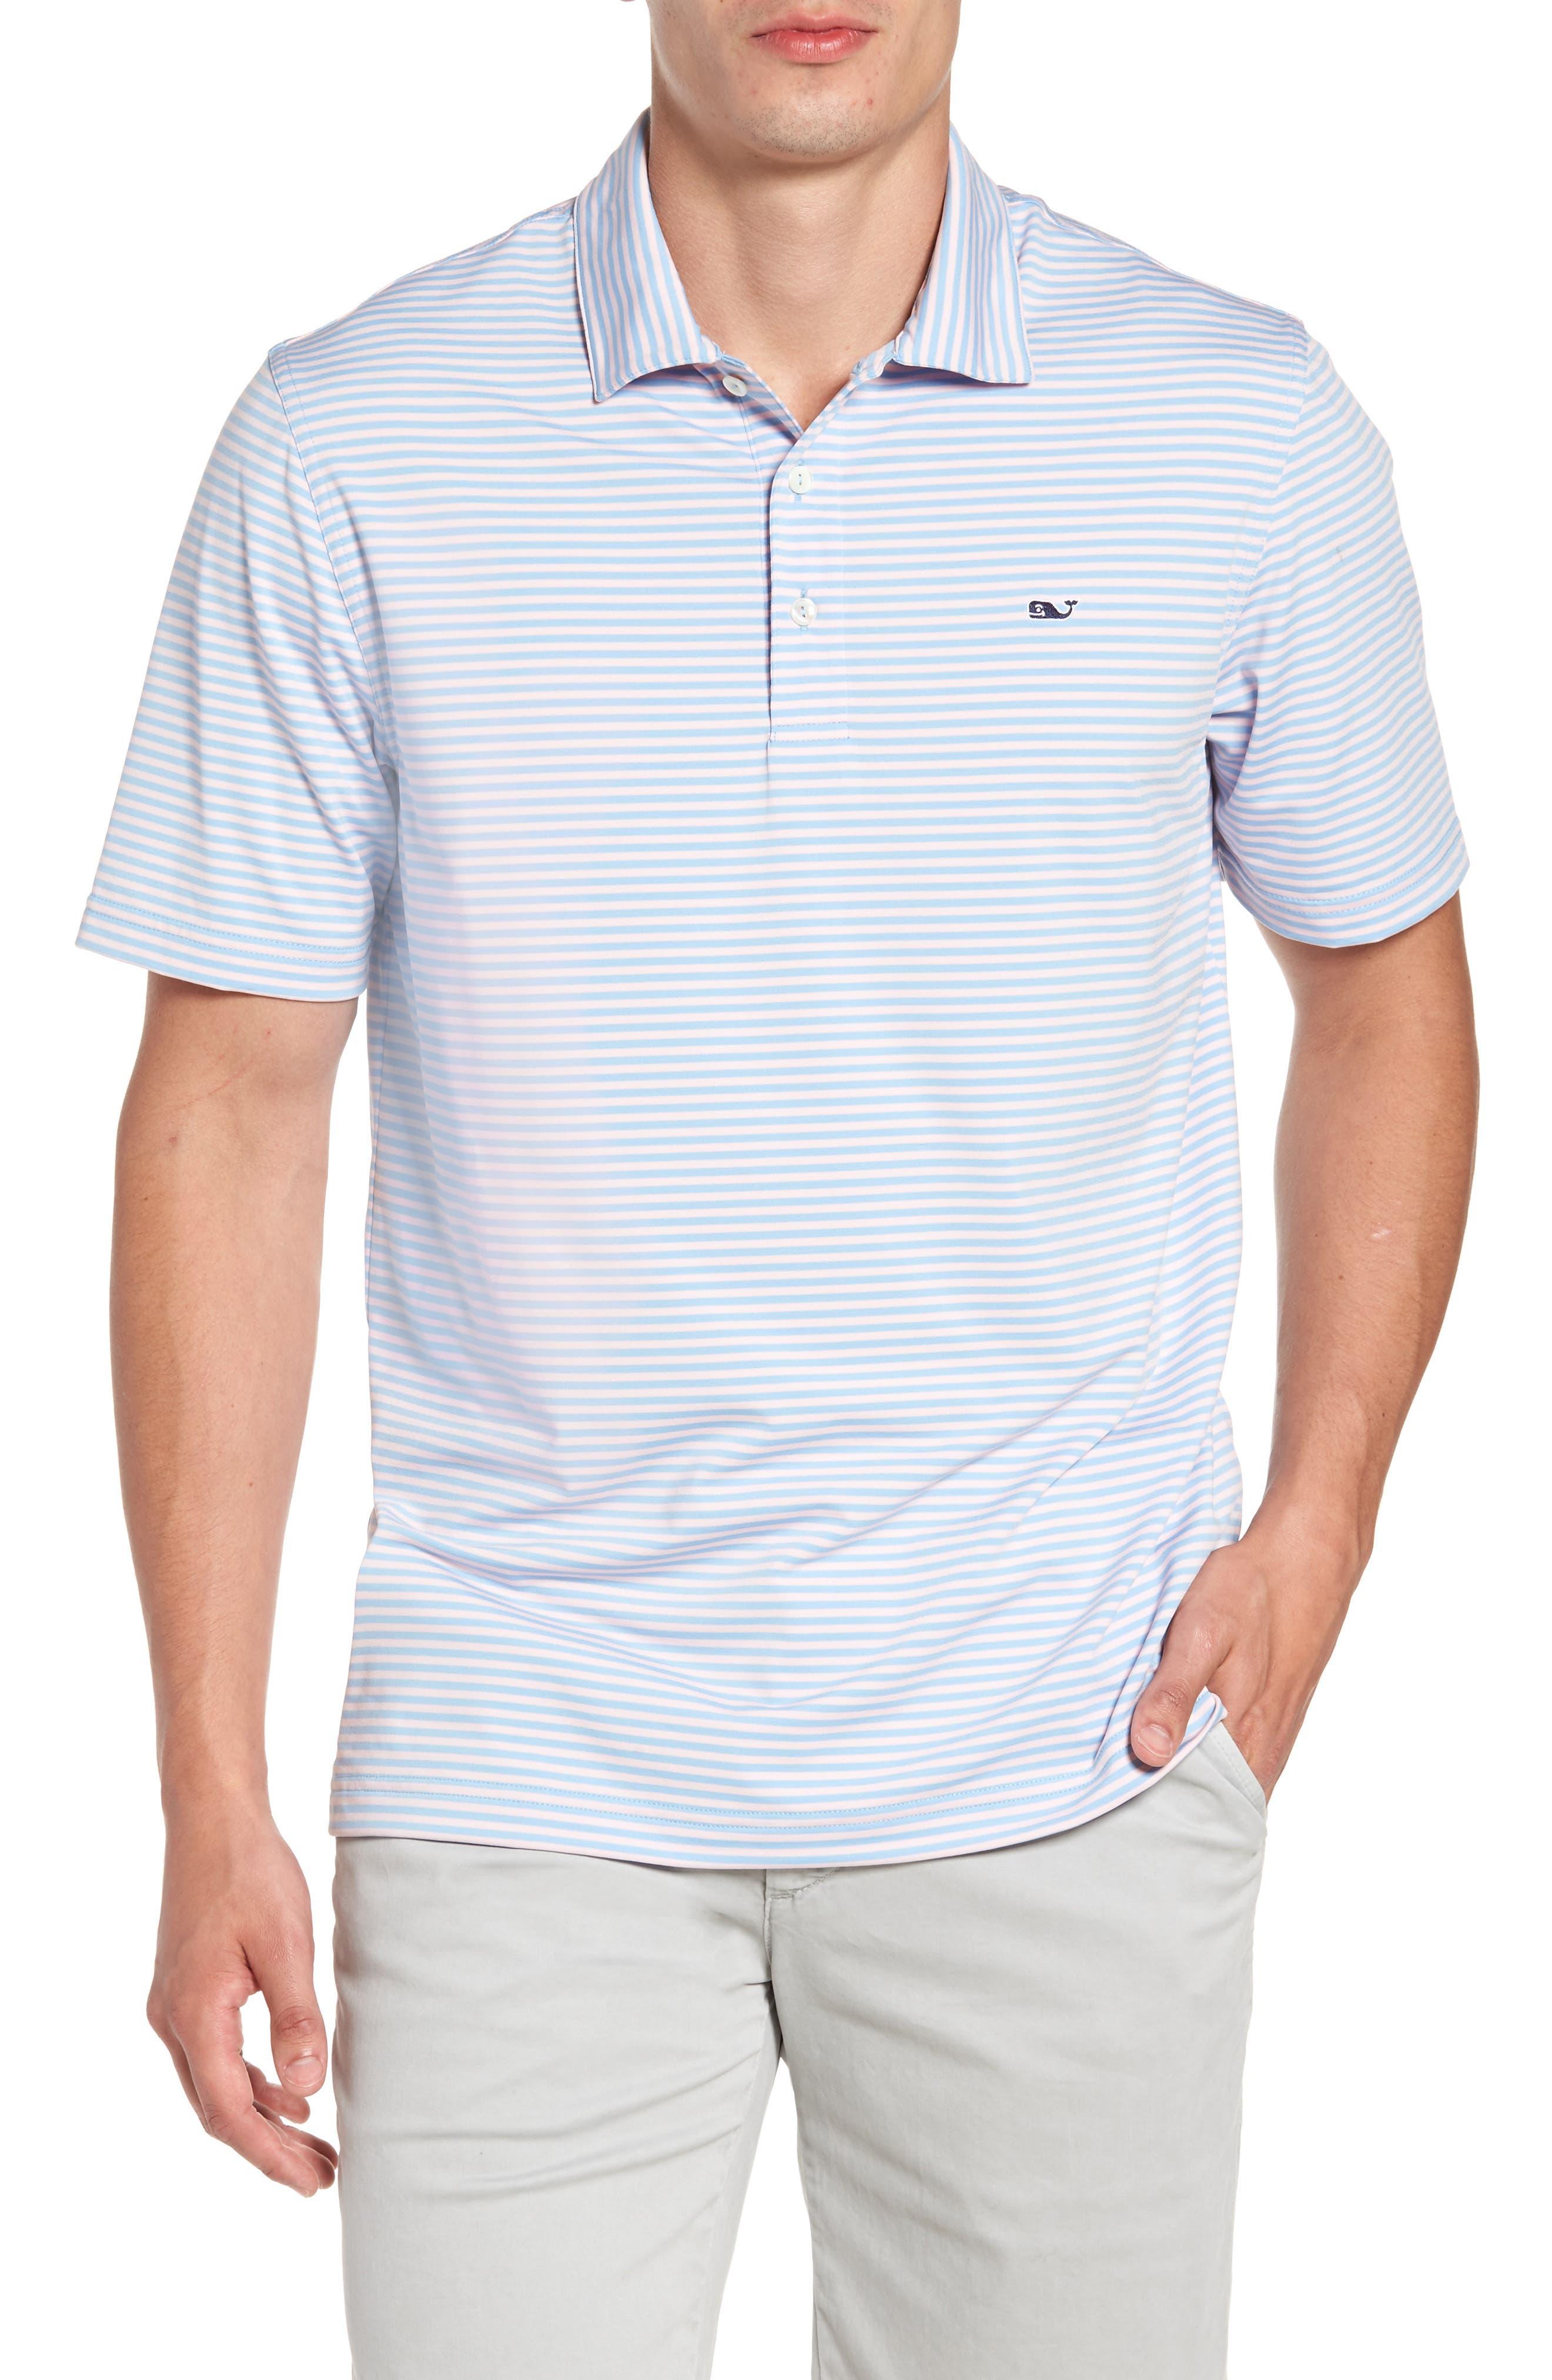 Vineyard Vines 'Kennedy' Stripe Golf Polo